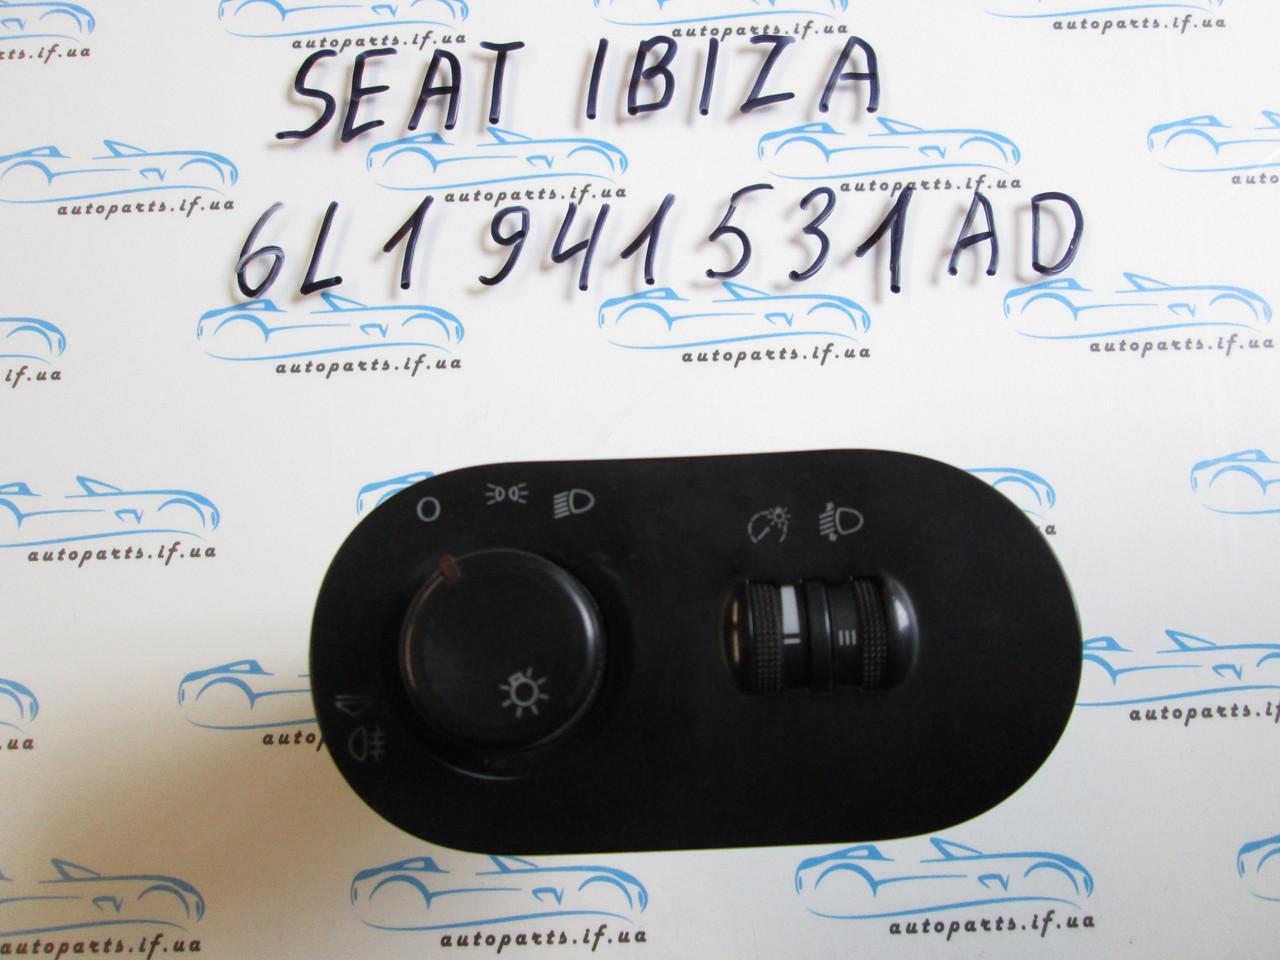 Переключатель света Seat Ibiza 6L1941531AD